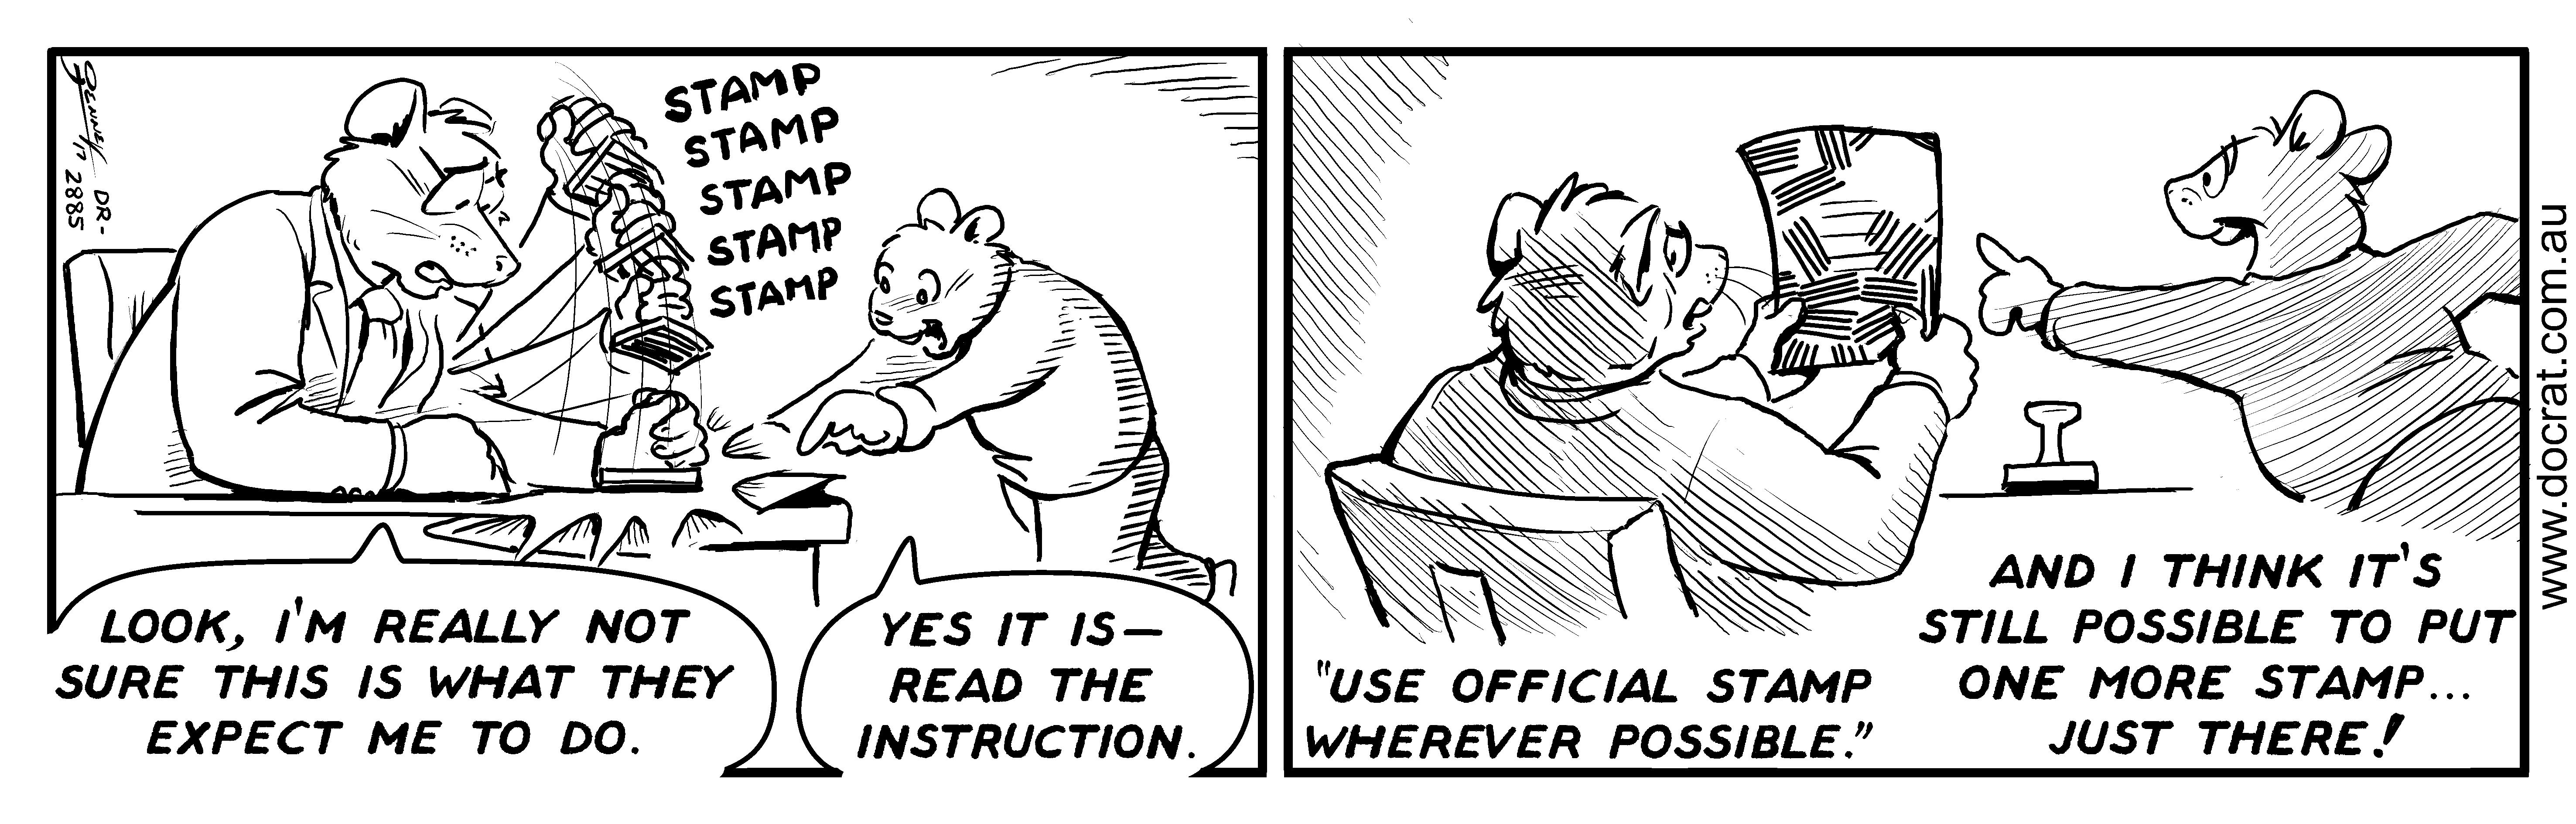 20171013